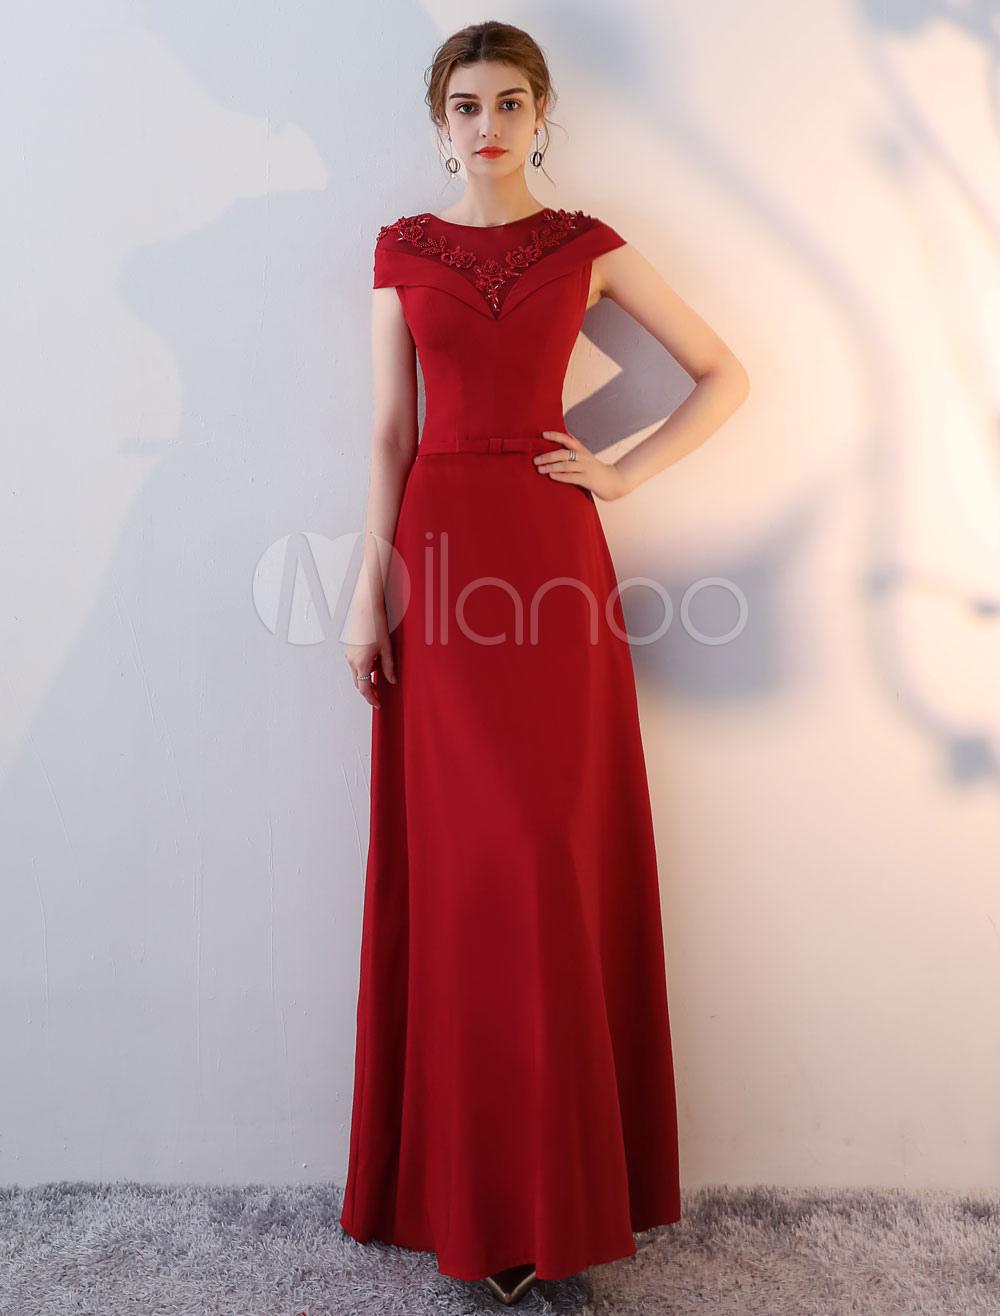 Burgundy Evening Dresses Satin Beading Applique Bow Sash Floor Length Formal Party Dress